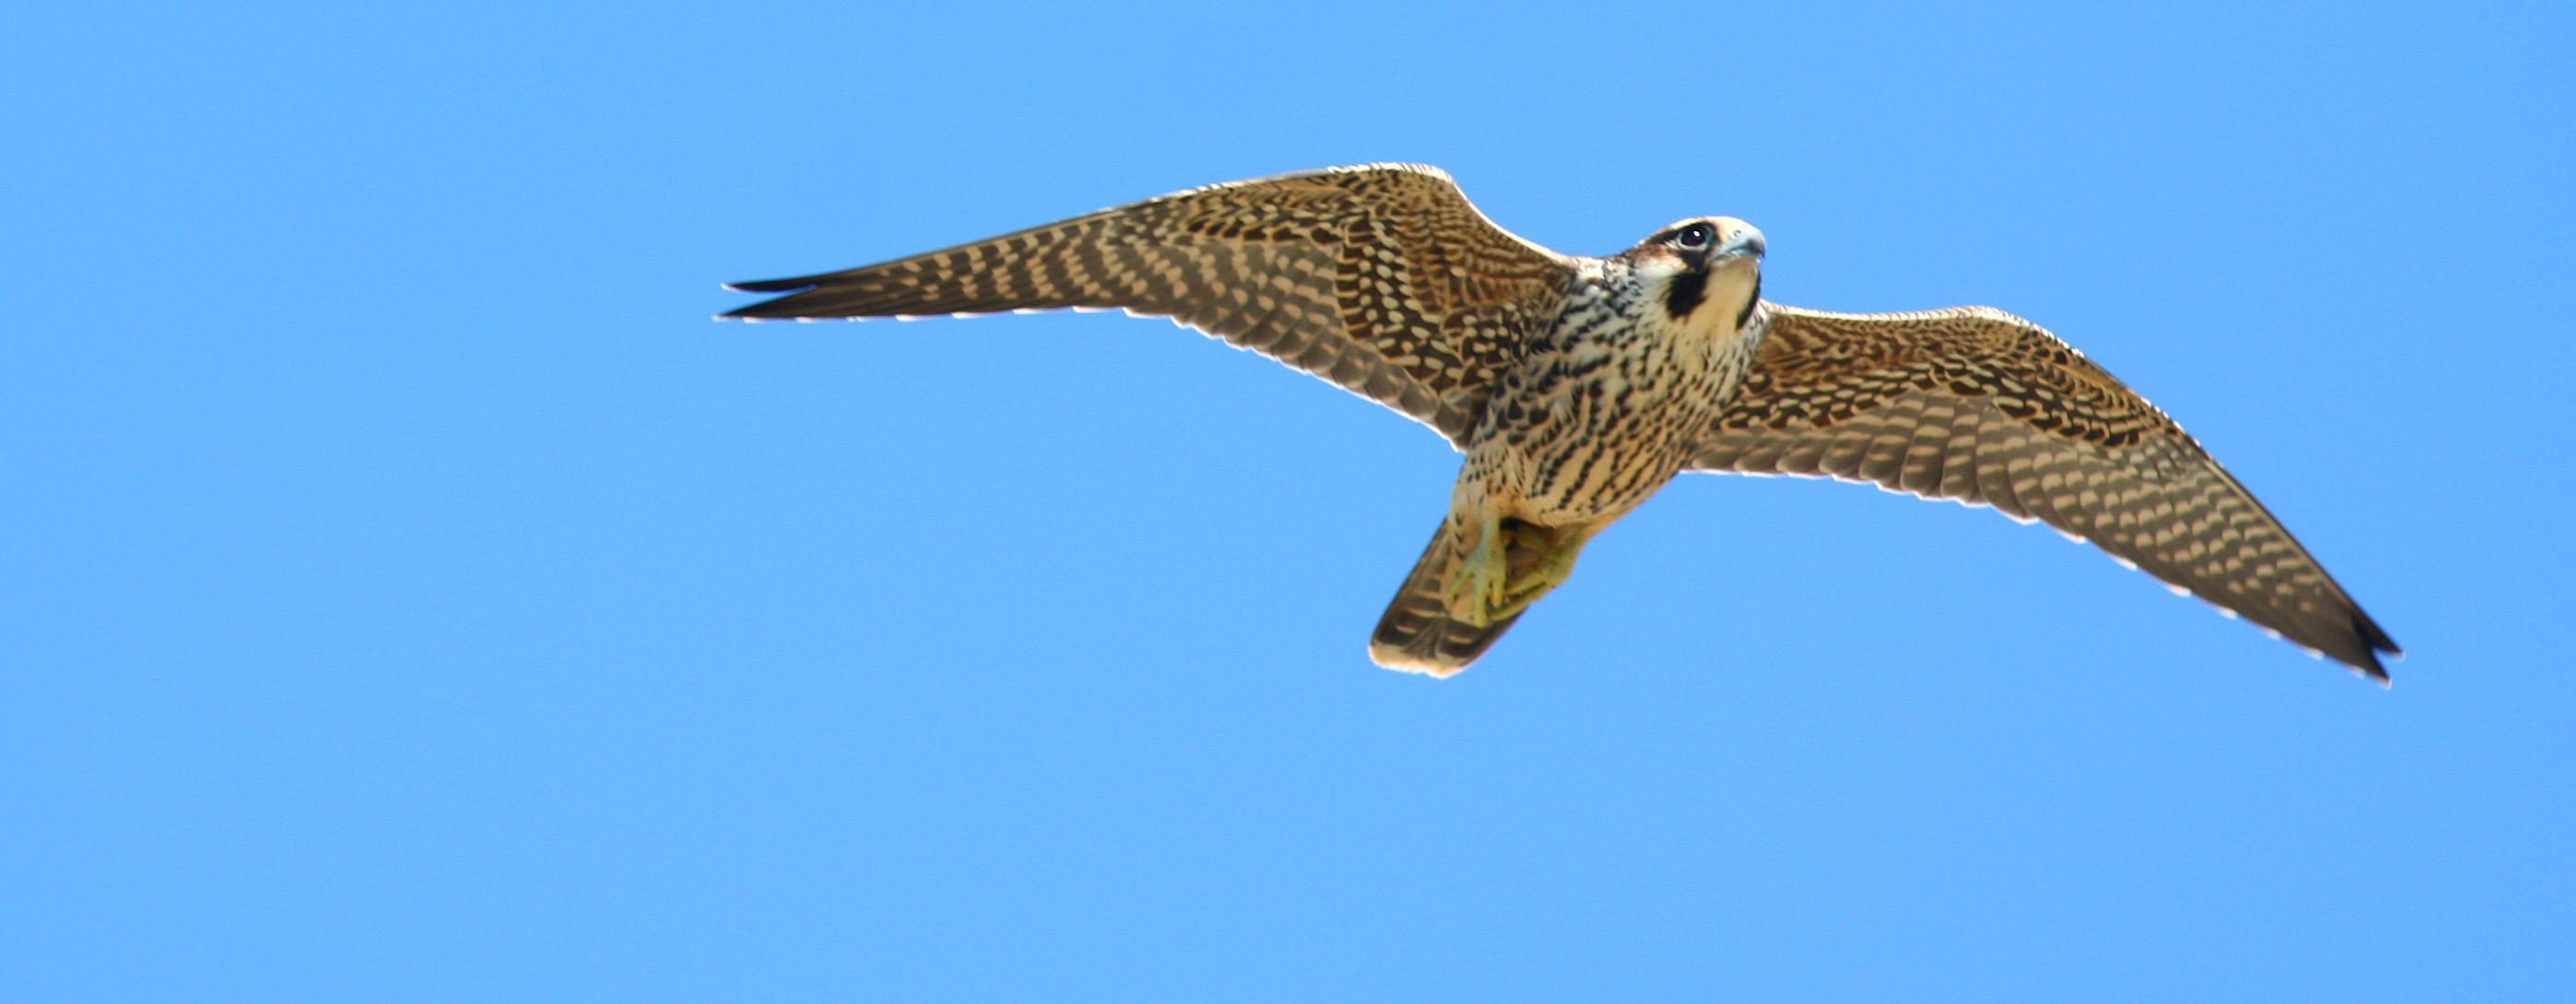 Peregrine Falcon Diving Wallpaper Peregrine Falcon Diving Gif